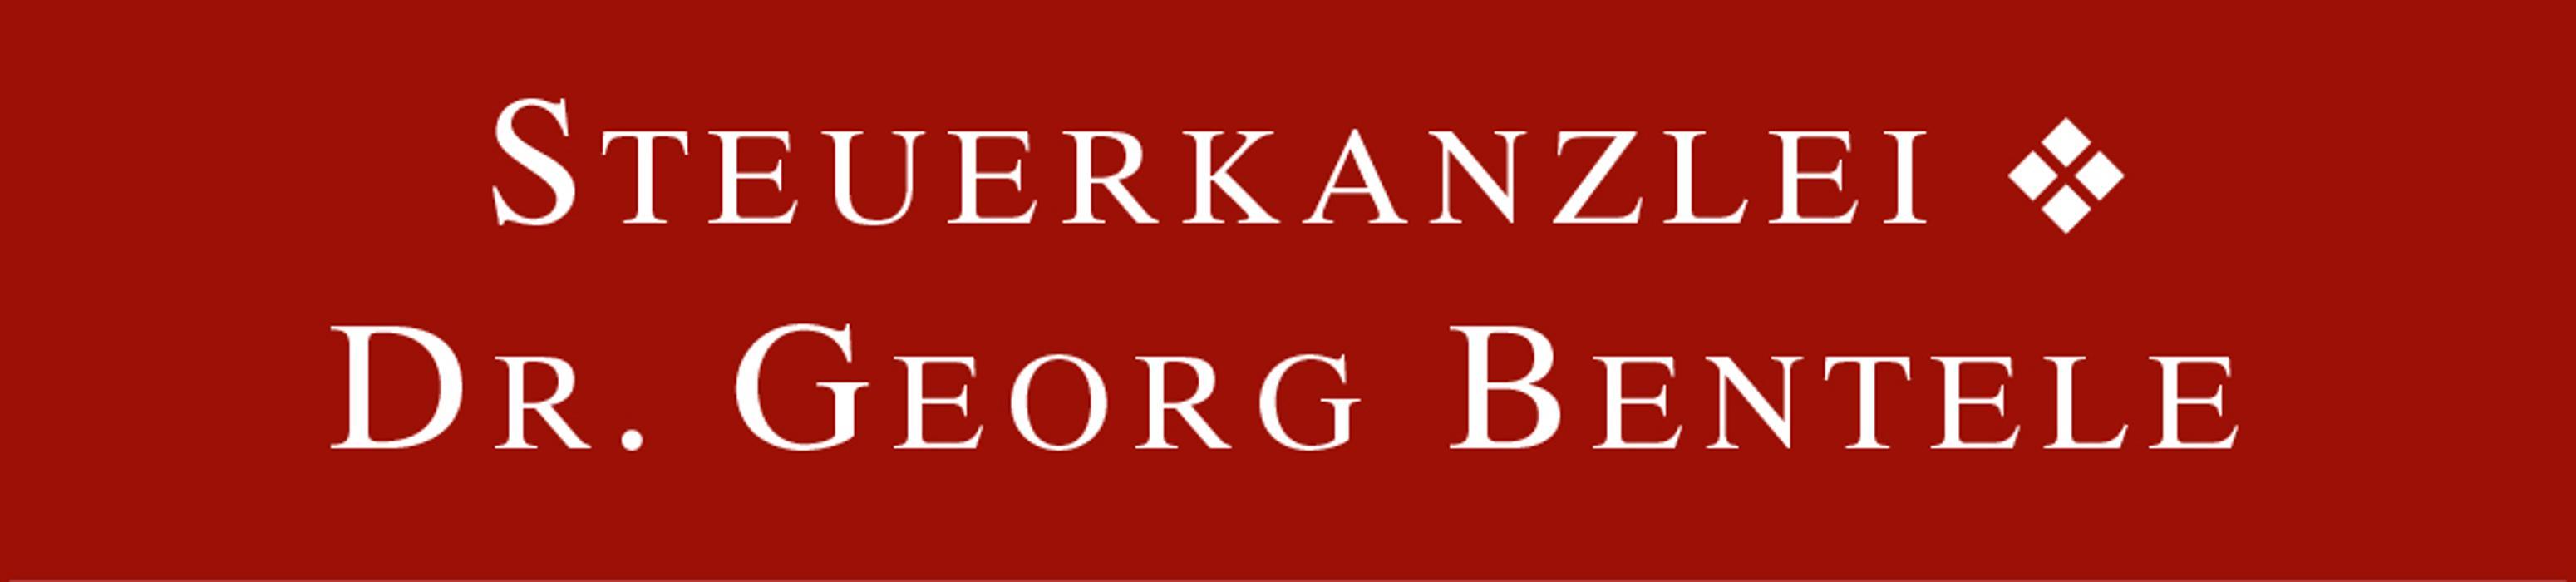 Bild zu Steuerkanzlei Dr. Georg Bentele in Villingen Schwenningen